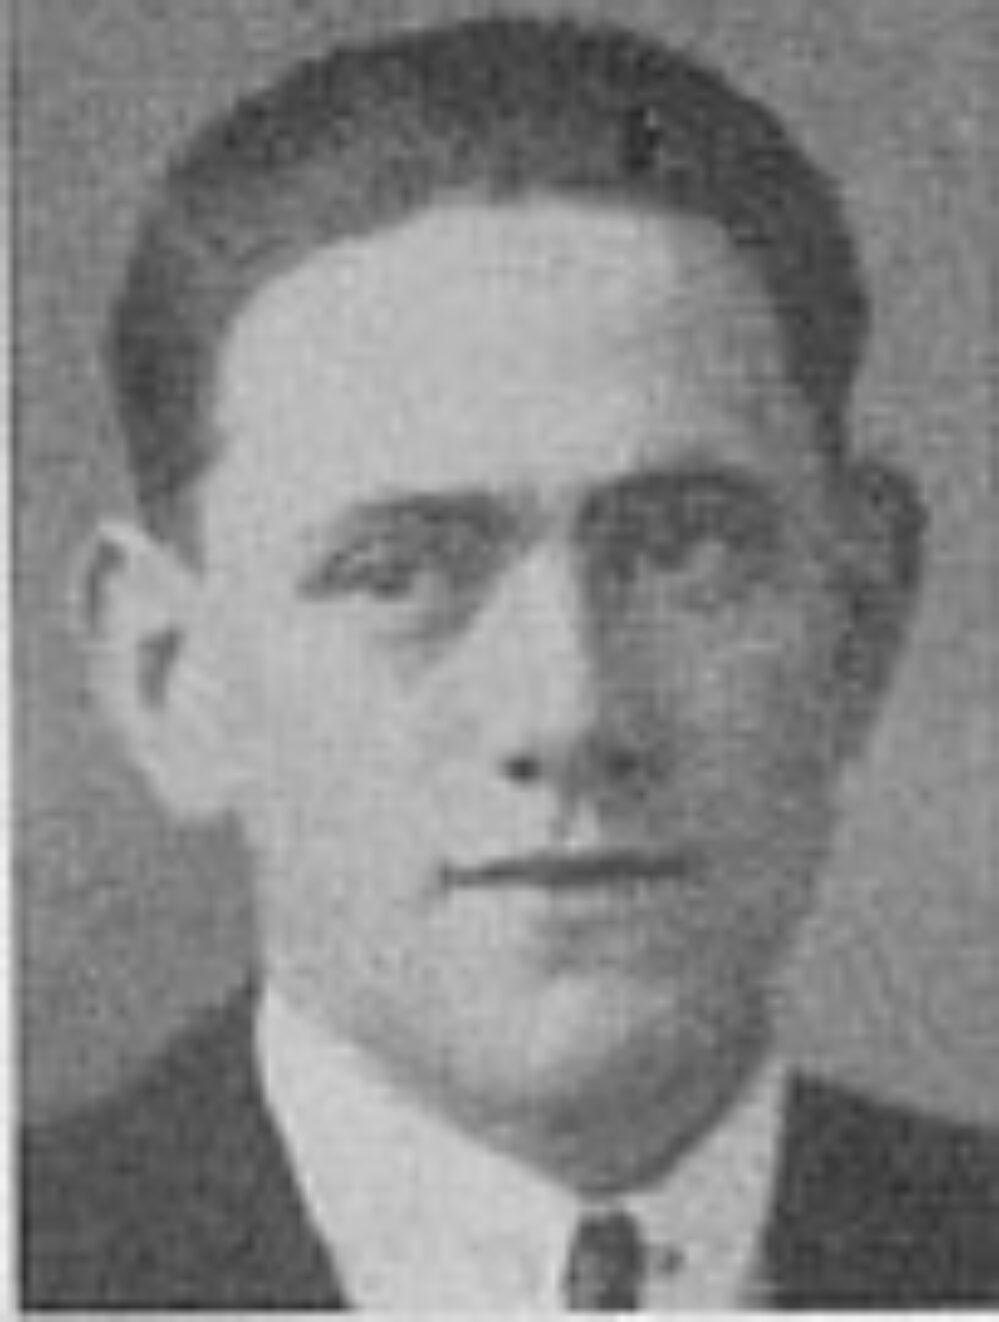 Olav Ingvald Gamlem